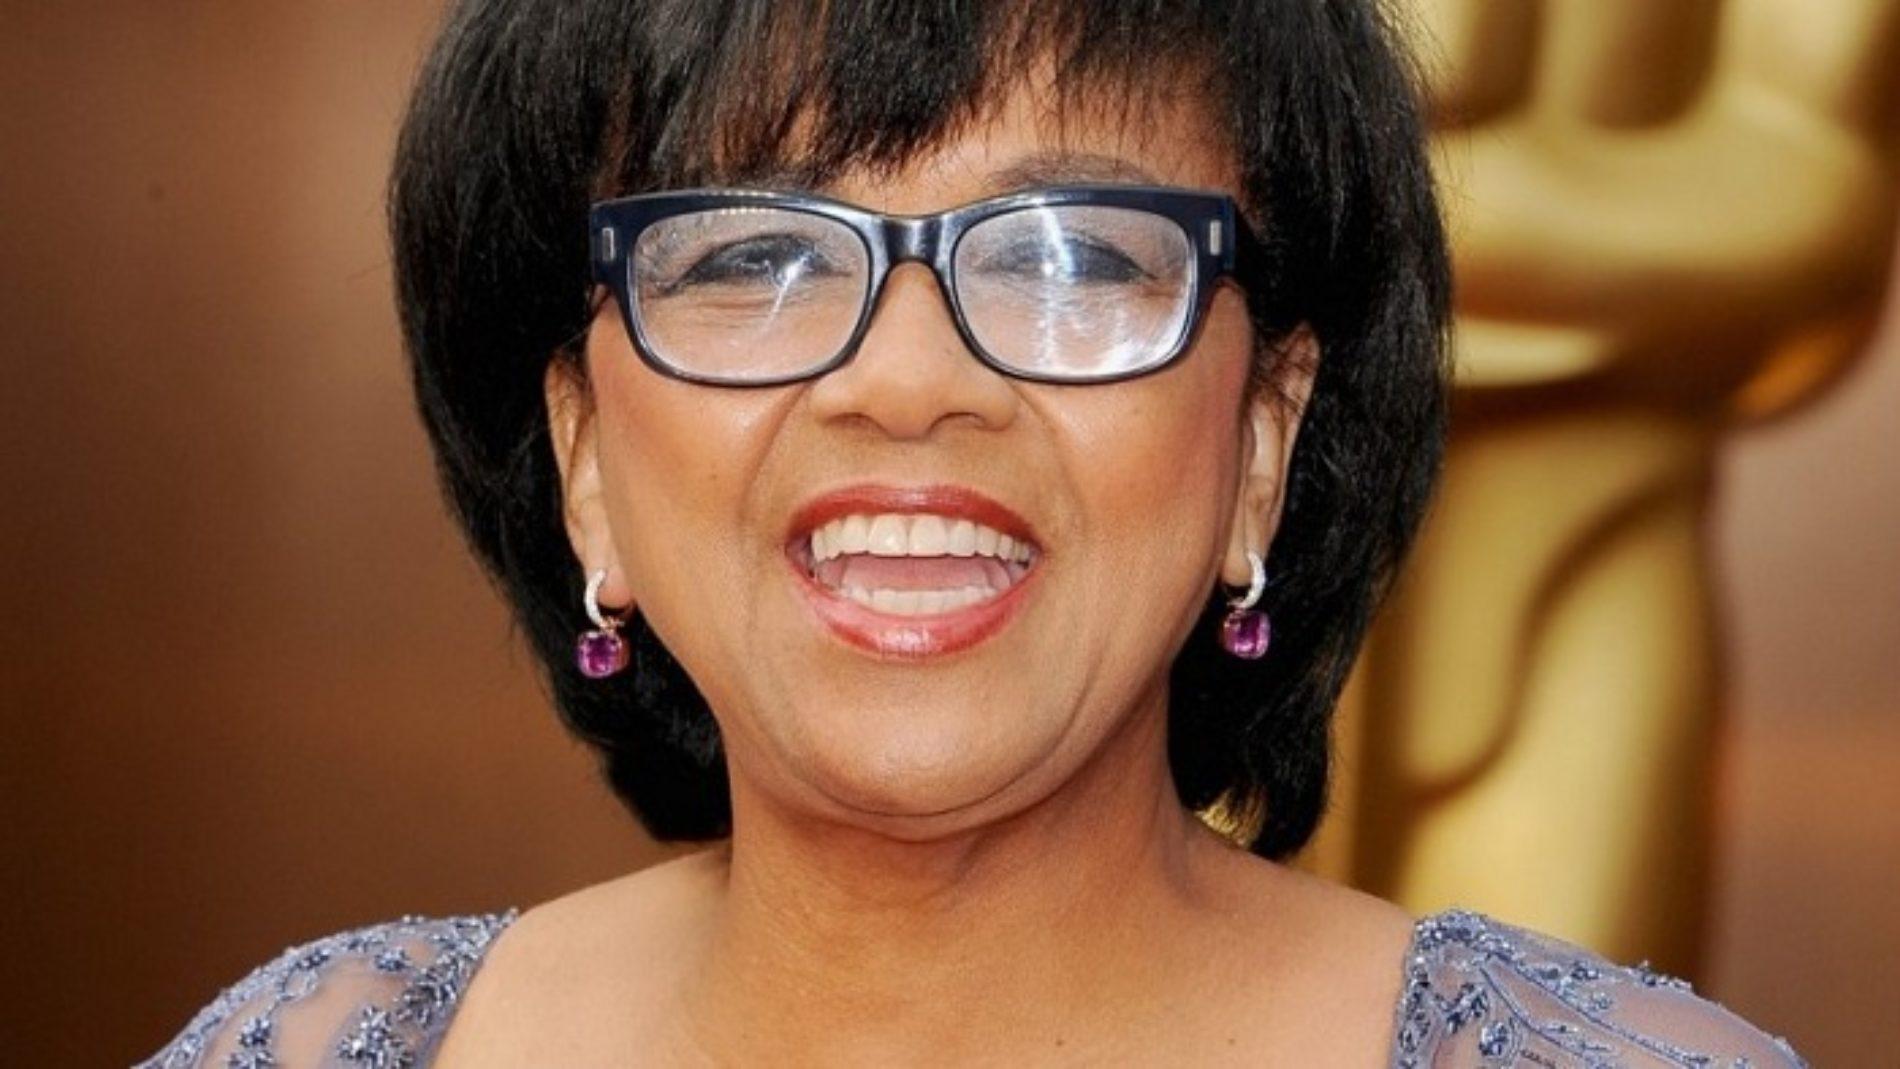 Academy president Cheryl Boone Isaacs addresses lack of diversity in 2016 Oscars